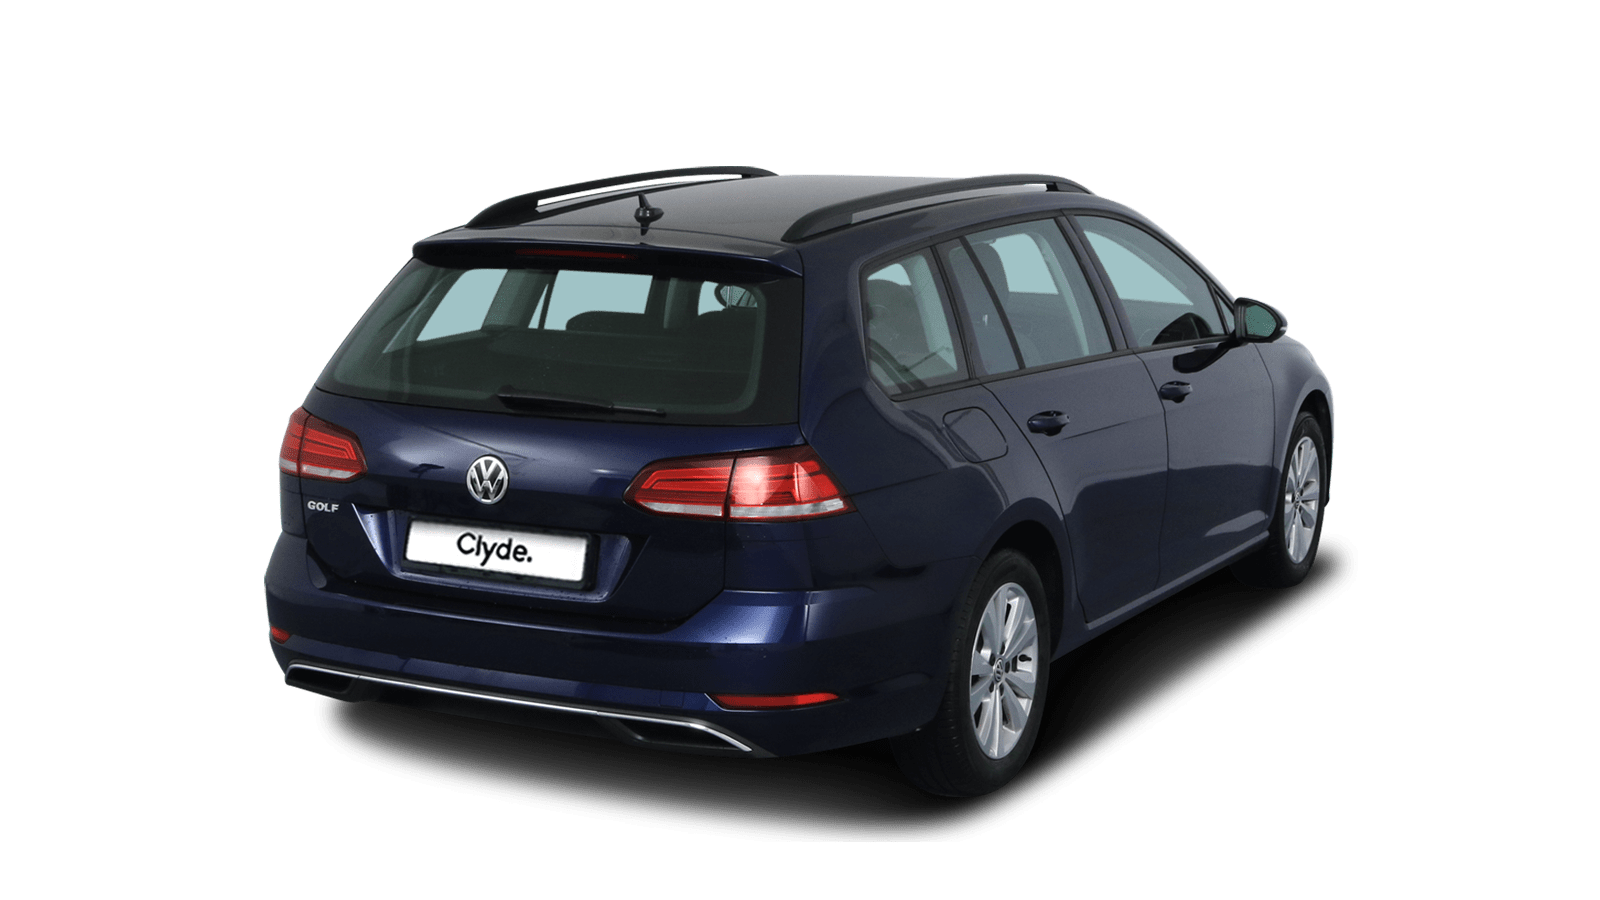 VW Golf Variant Blue front - Clyde car subscription